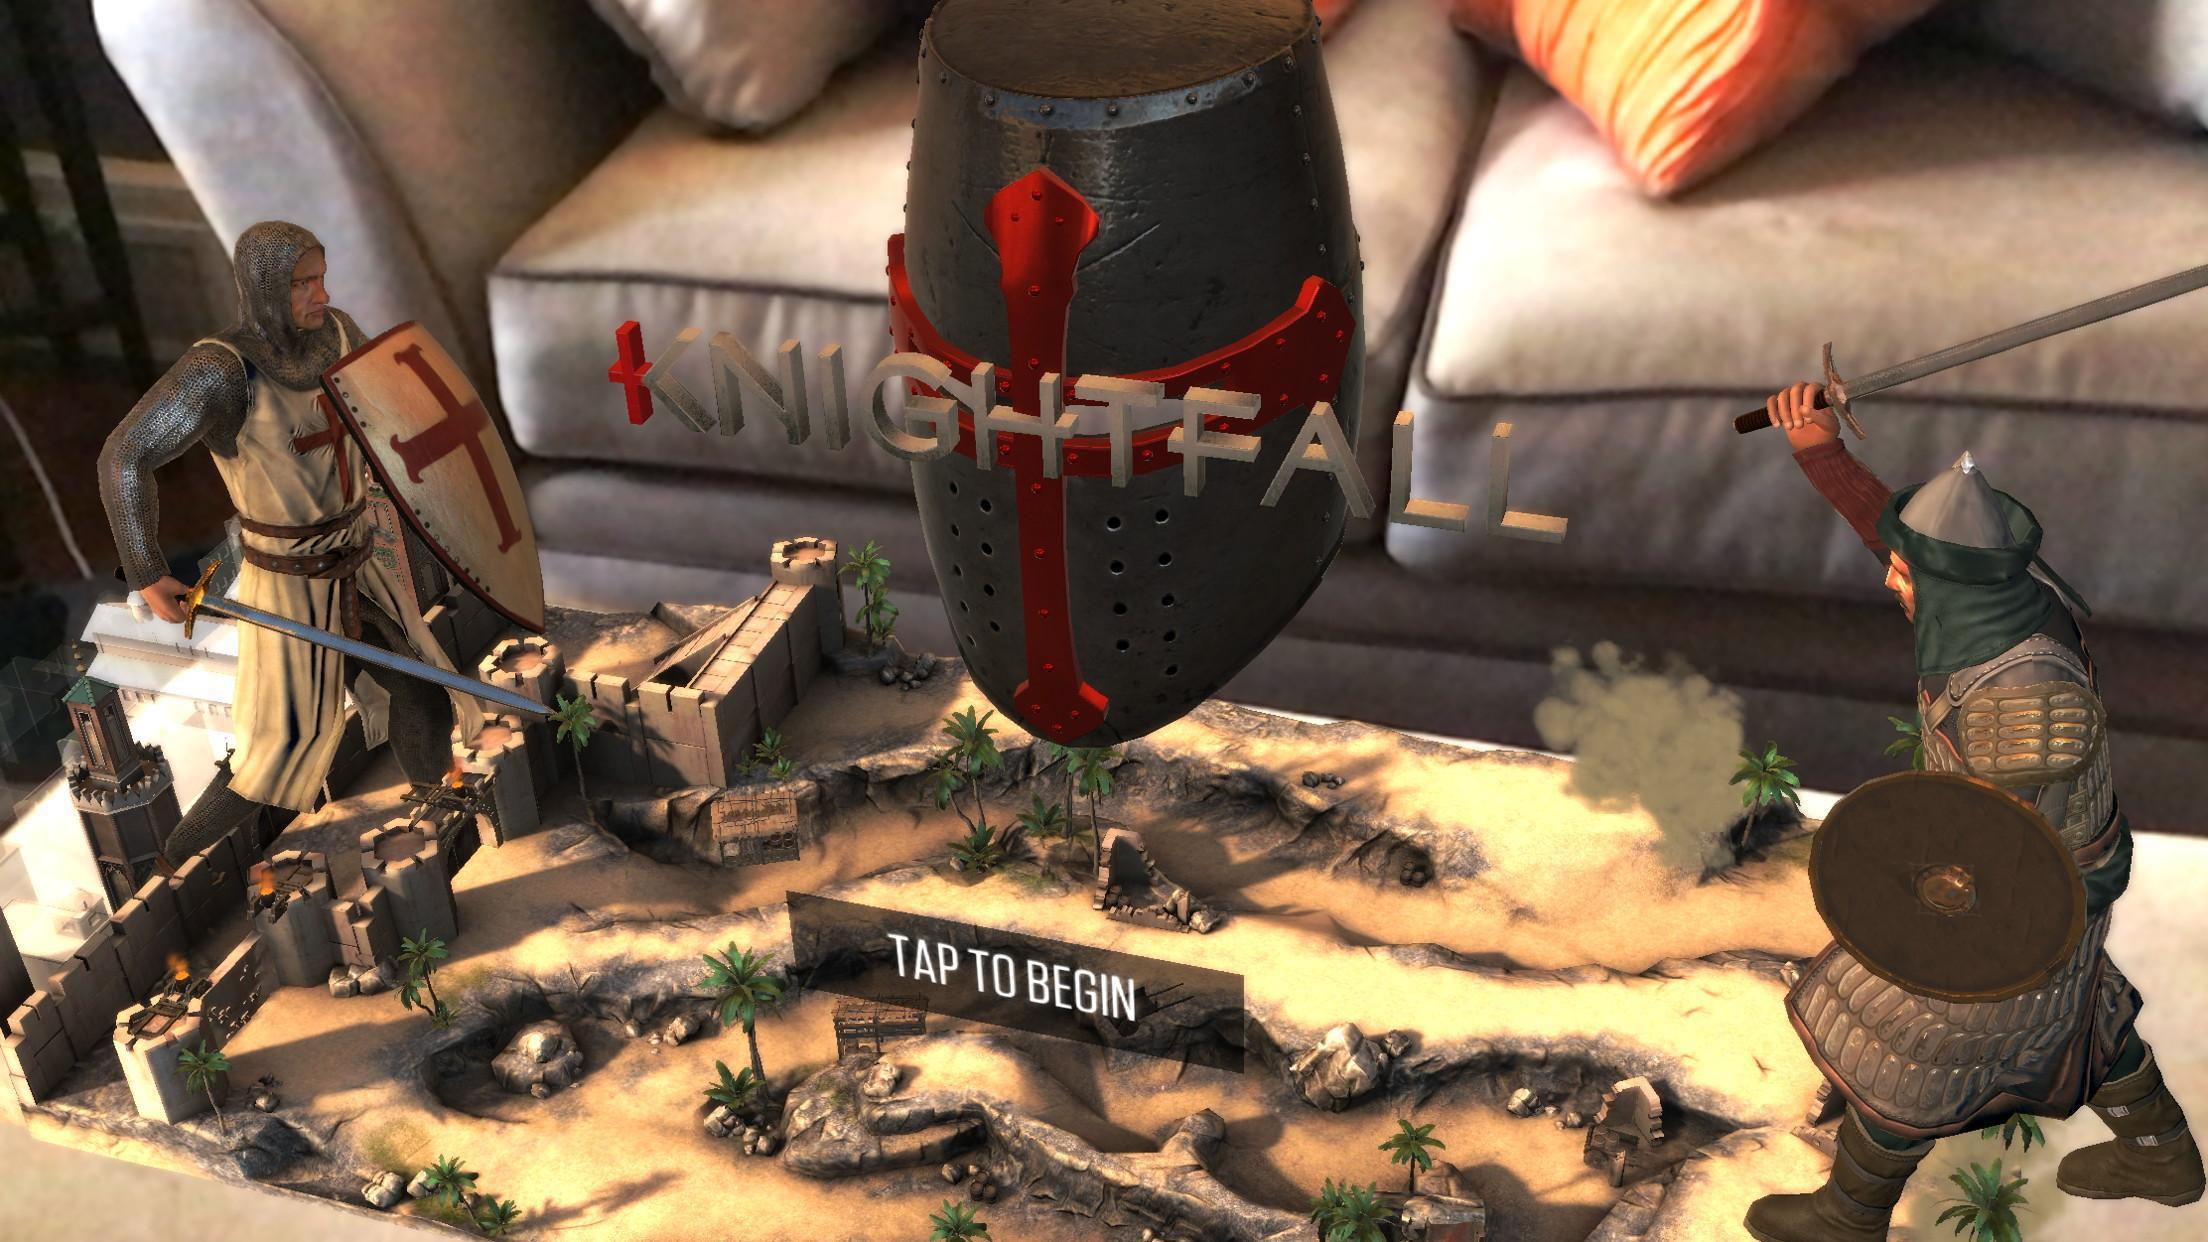 KnightfallAR game